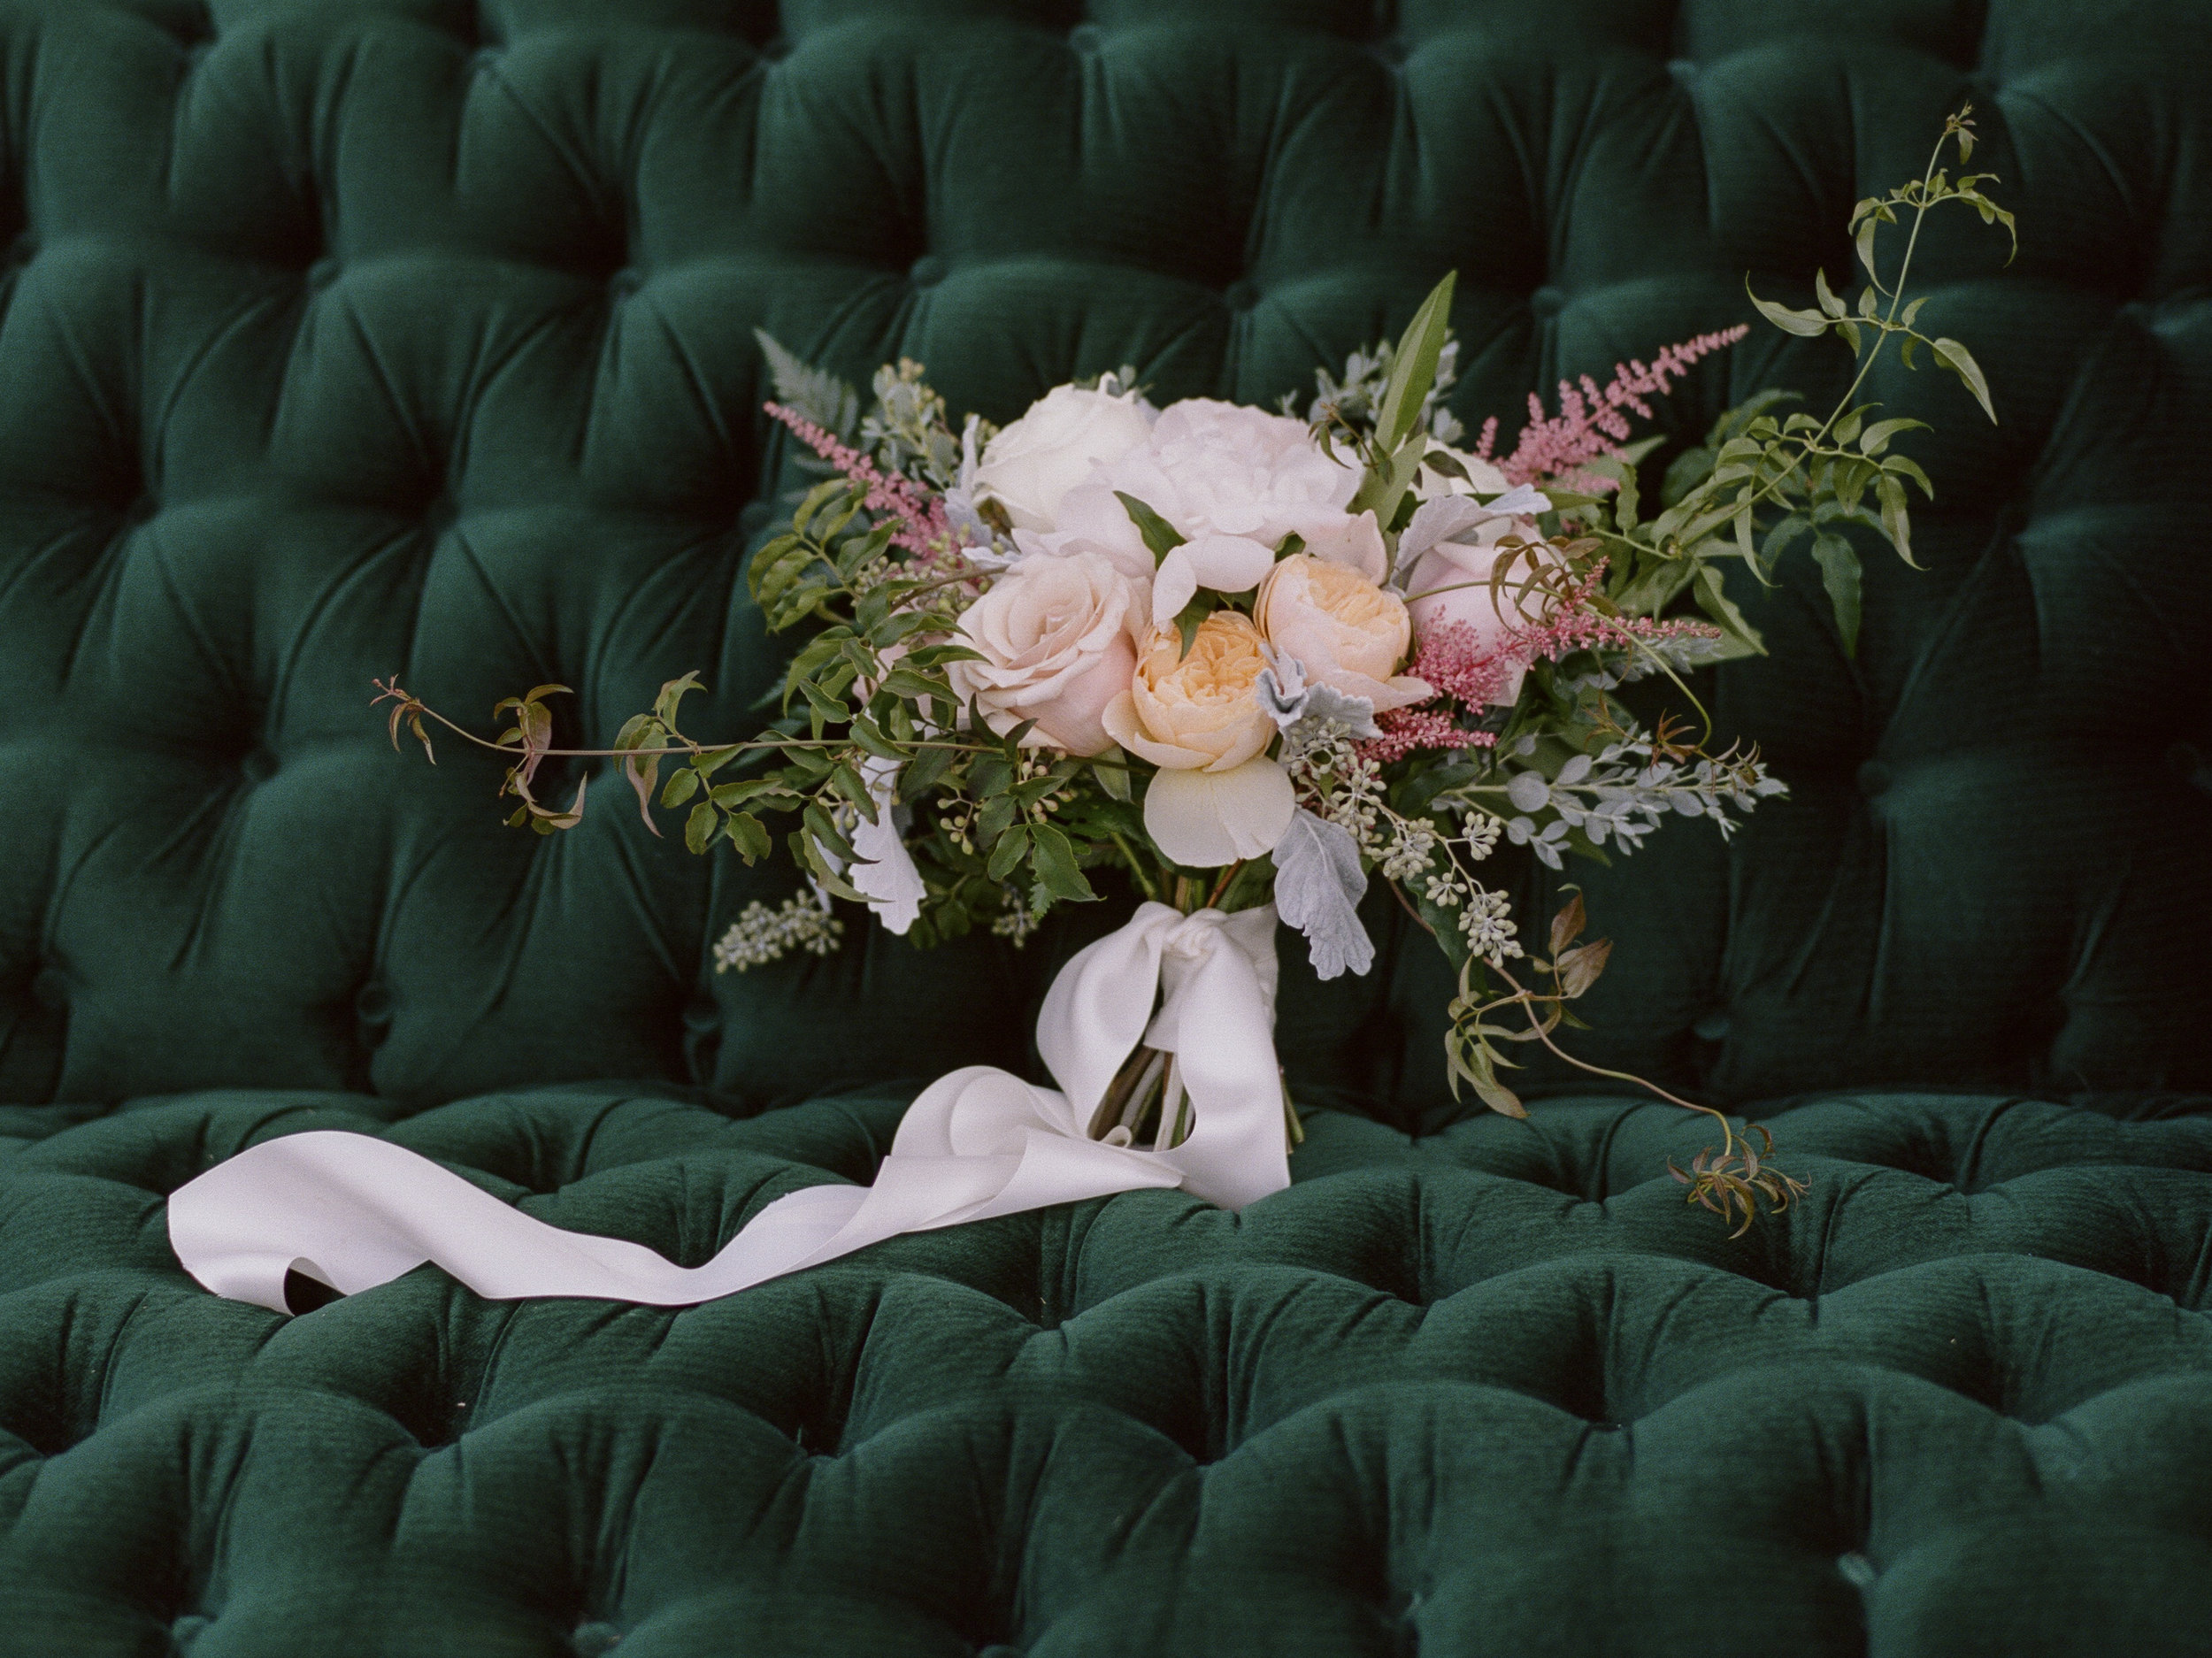 Violette-fleurs-roseville-sacramento-california-Flower-farm-inn-wedding-florist-spring-bridal-bouquet-blush-peach.jpg